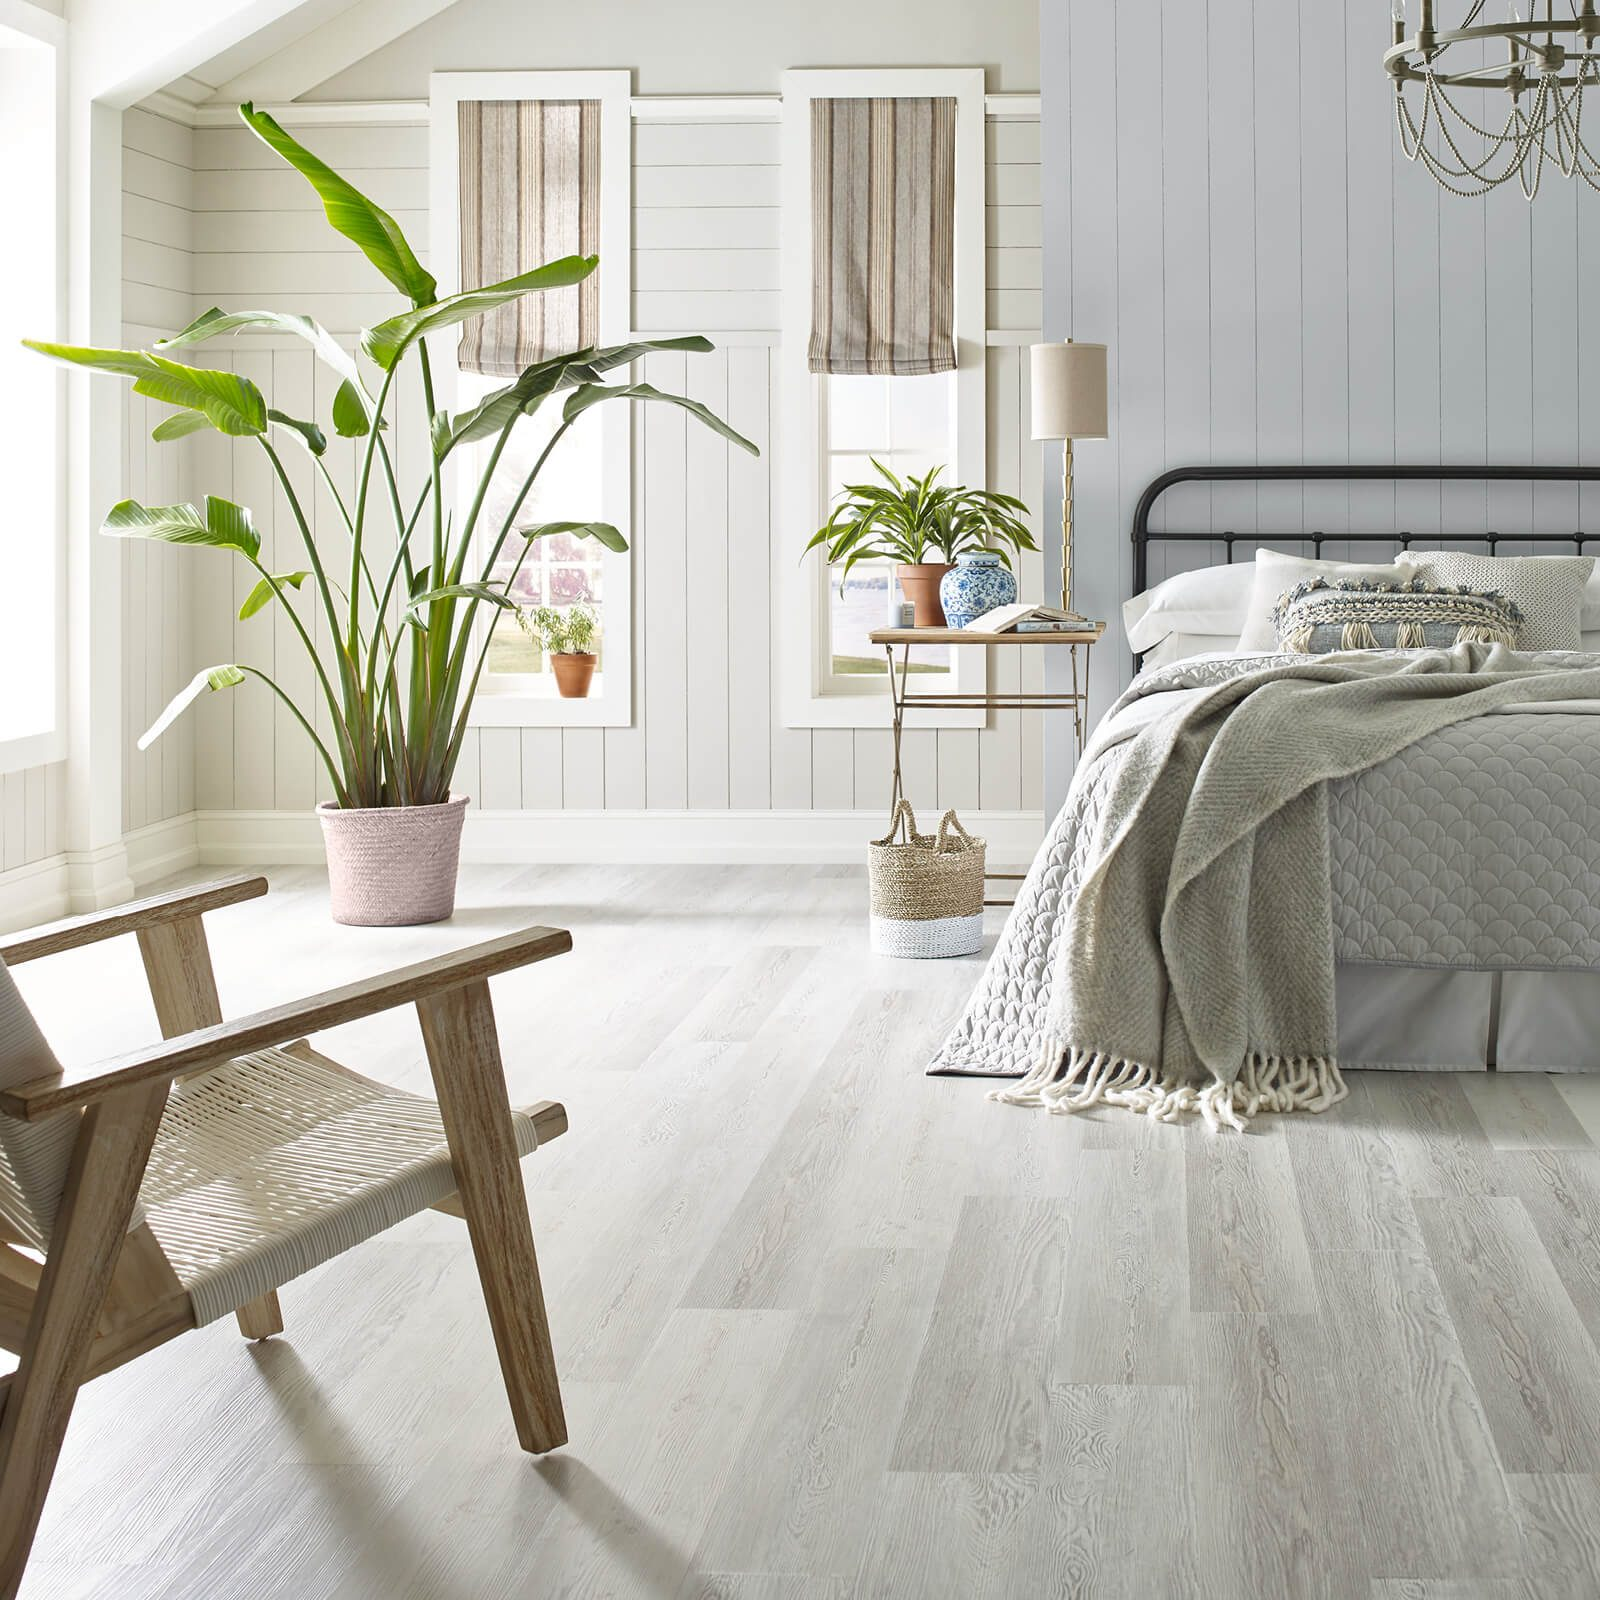 Bedroom flooring | Elite Flooring and Interiors Inc